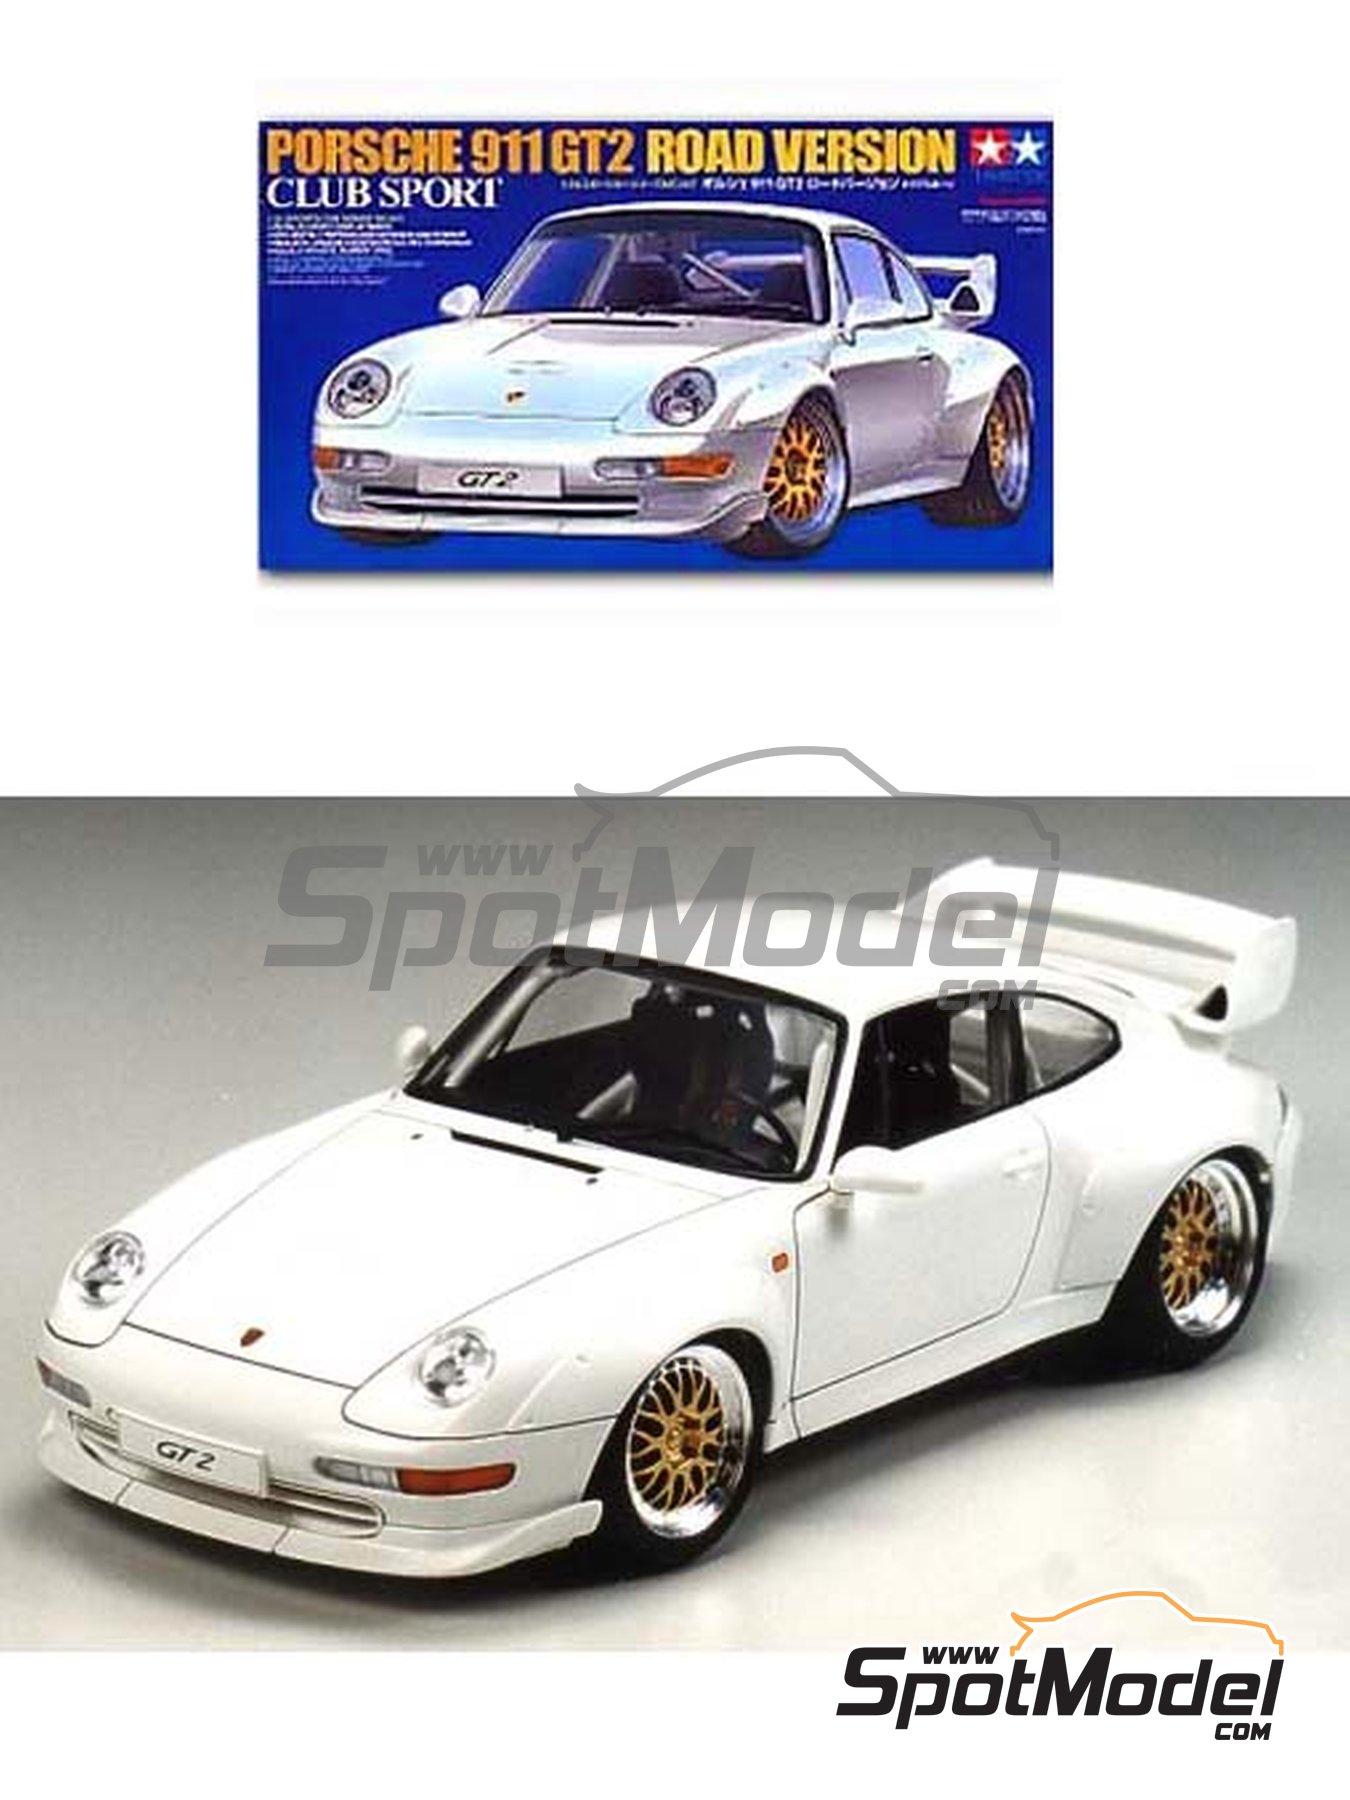 car kit 1 24 by tamiya porsche 911 993 gt2 club sport plastic model kit cars gt cars. Black Bedroom Furniture Sets. Home Design Ideas